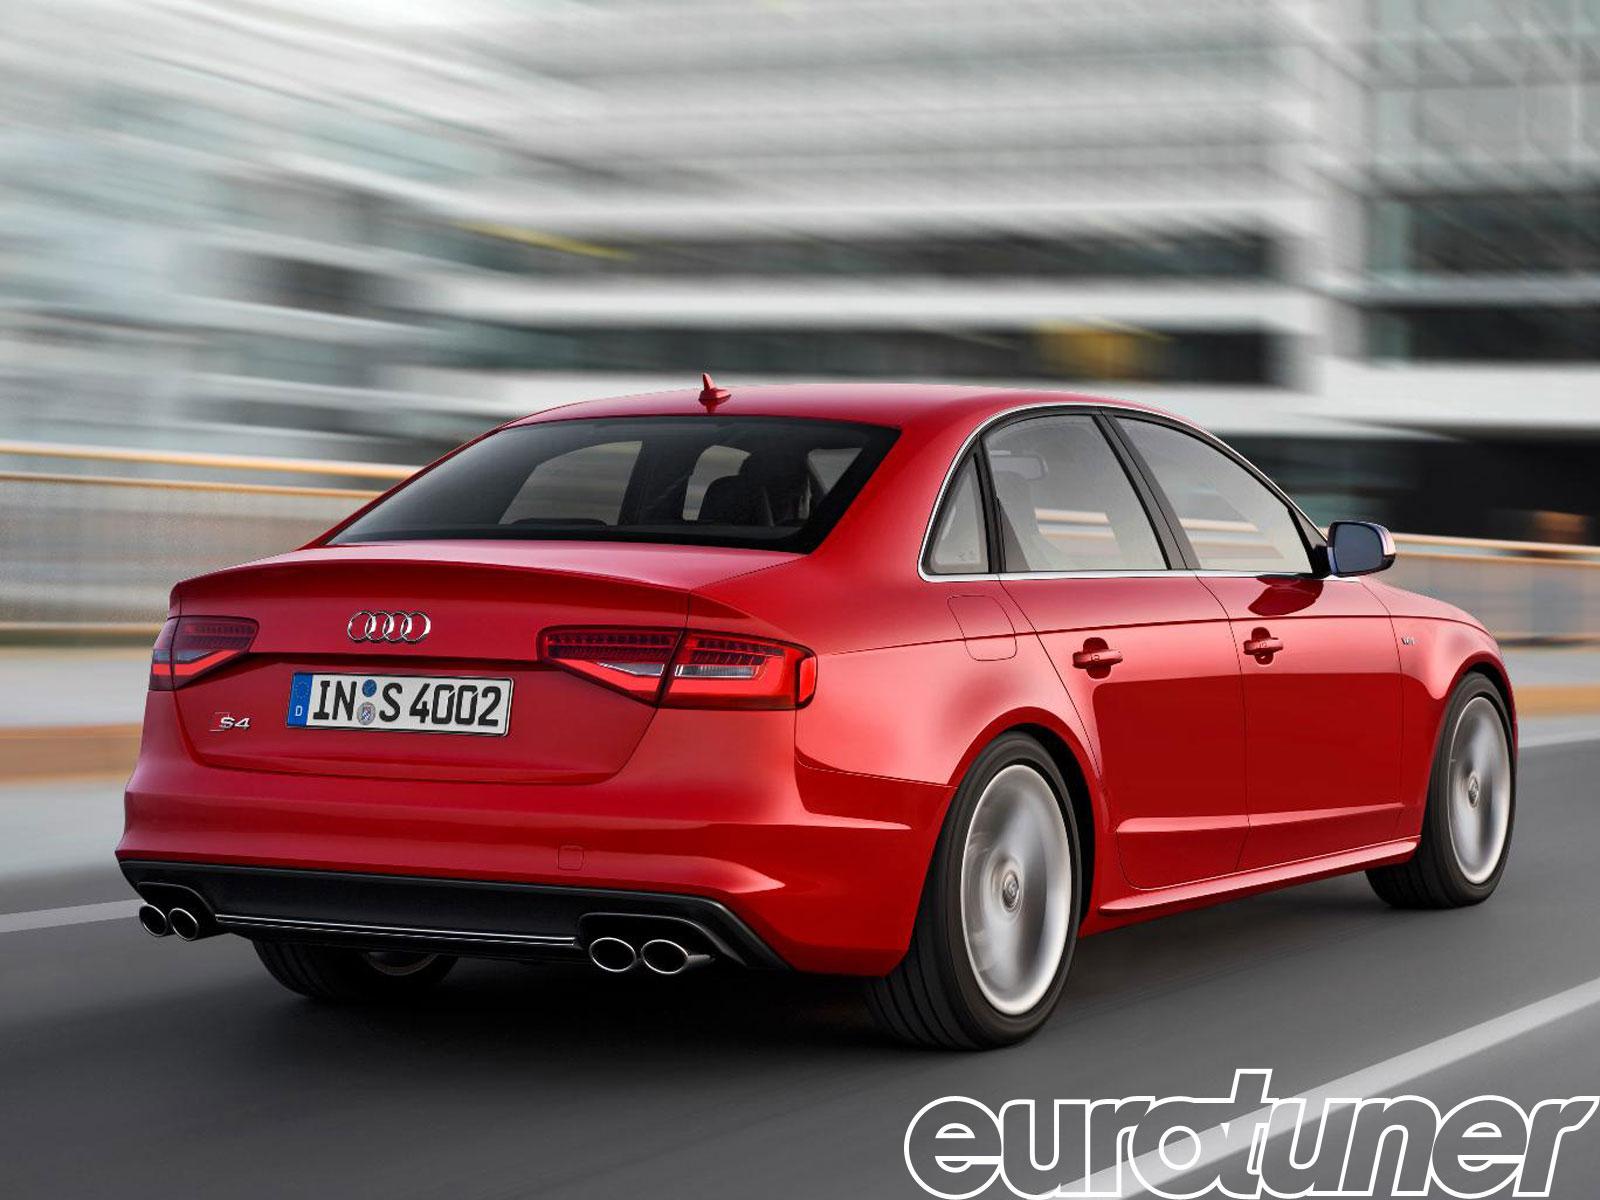 2012 Audi A4 Image 15